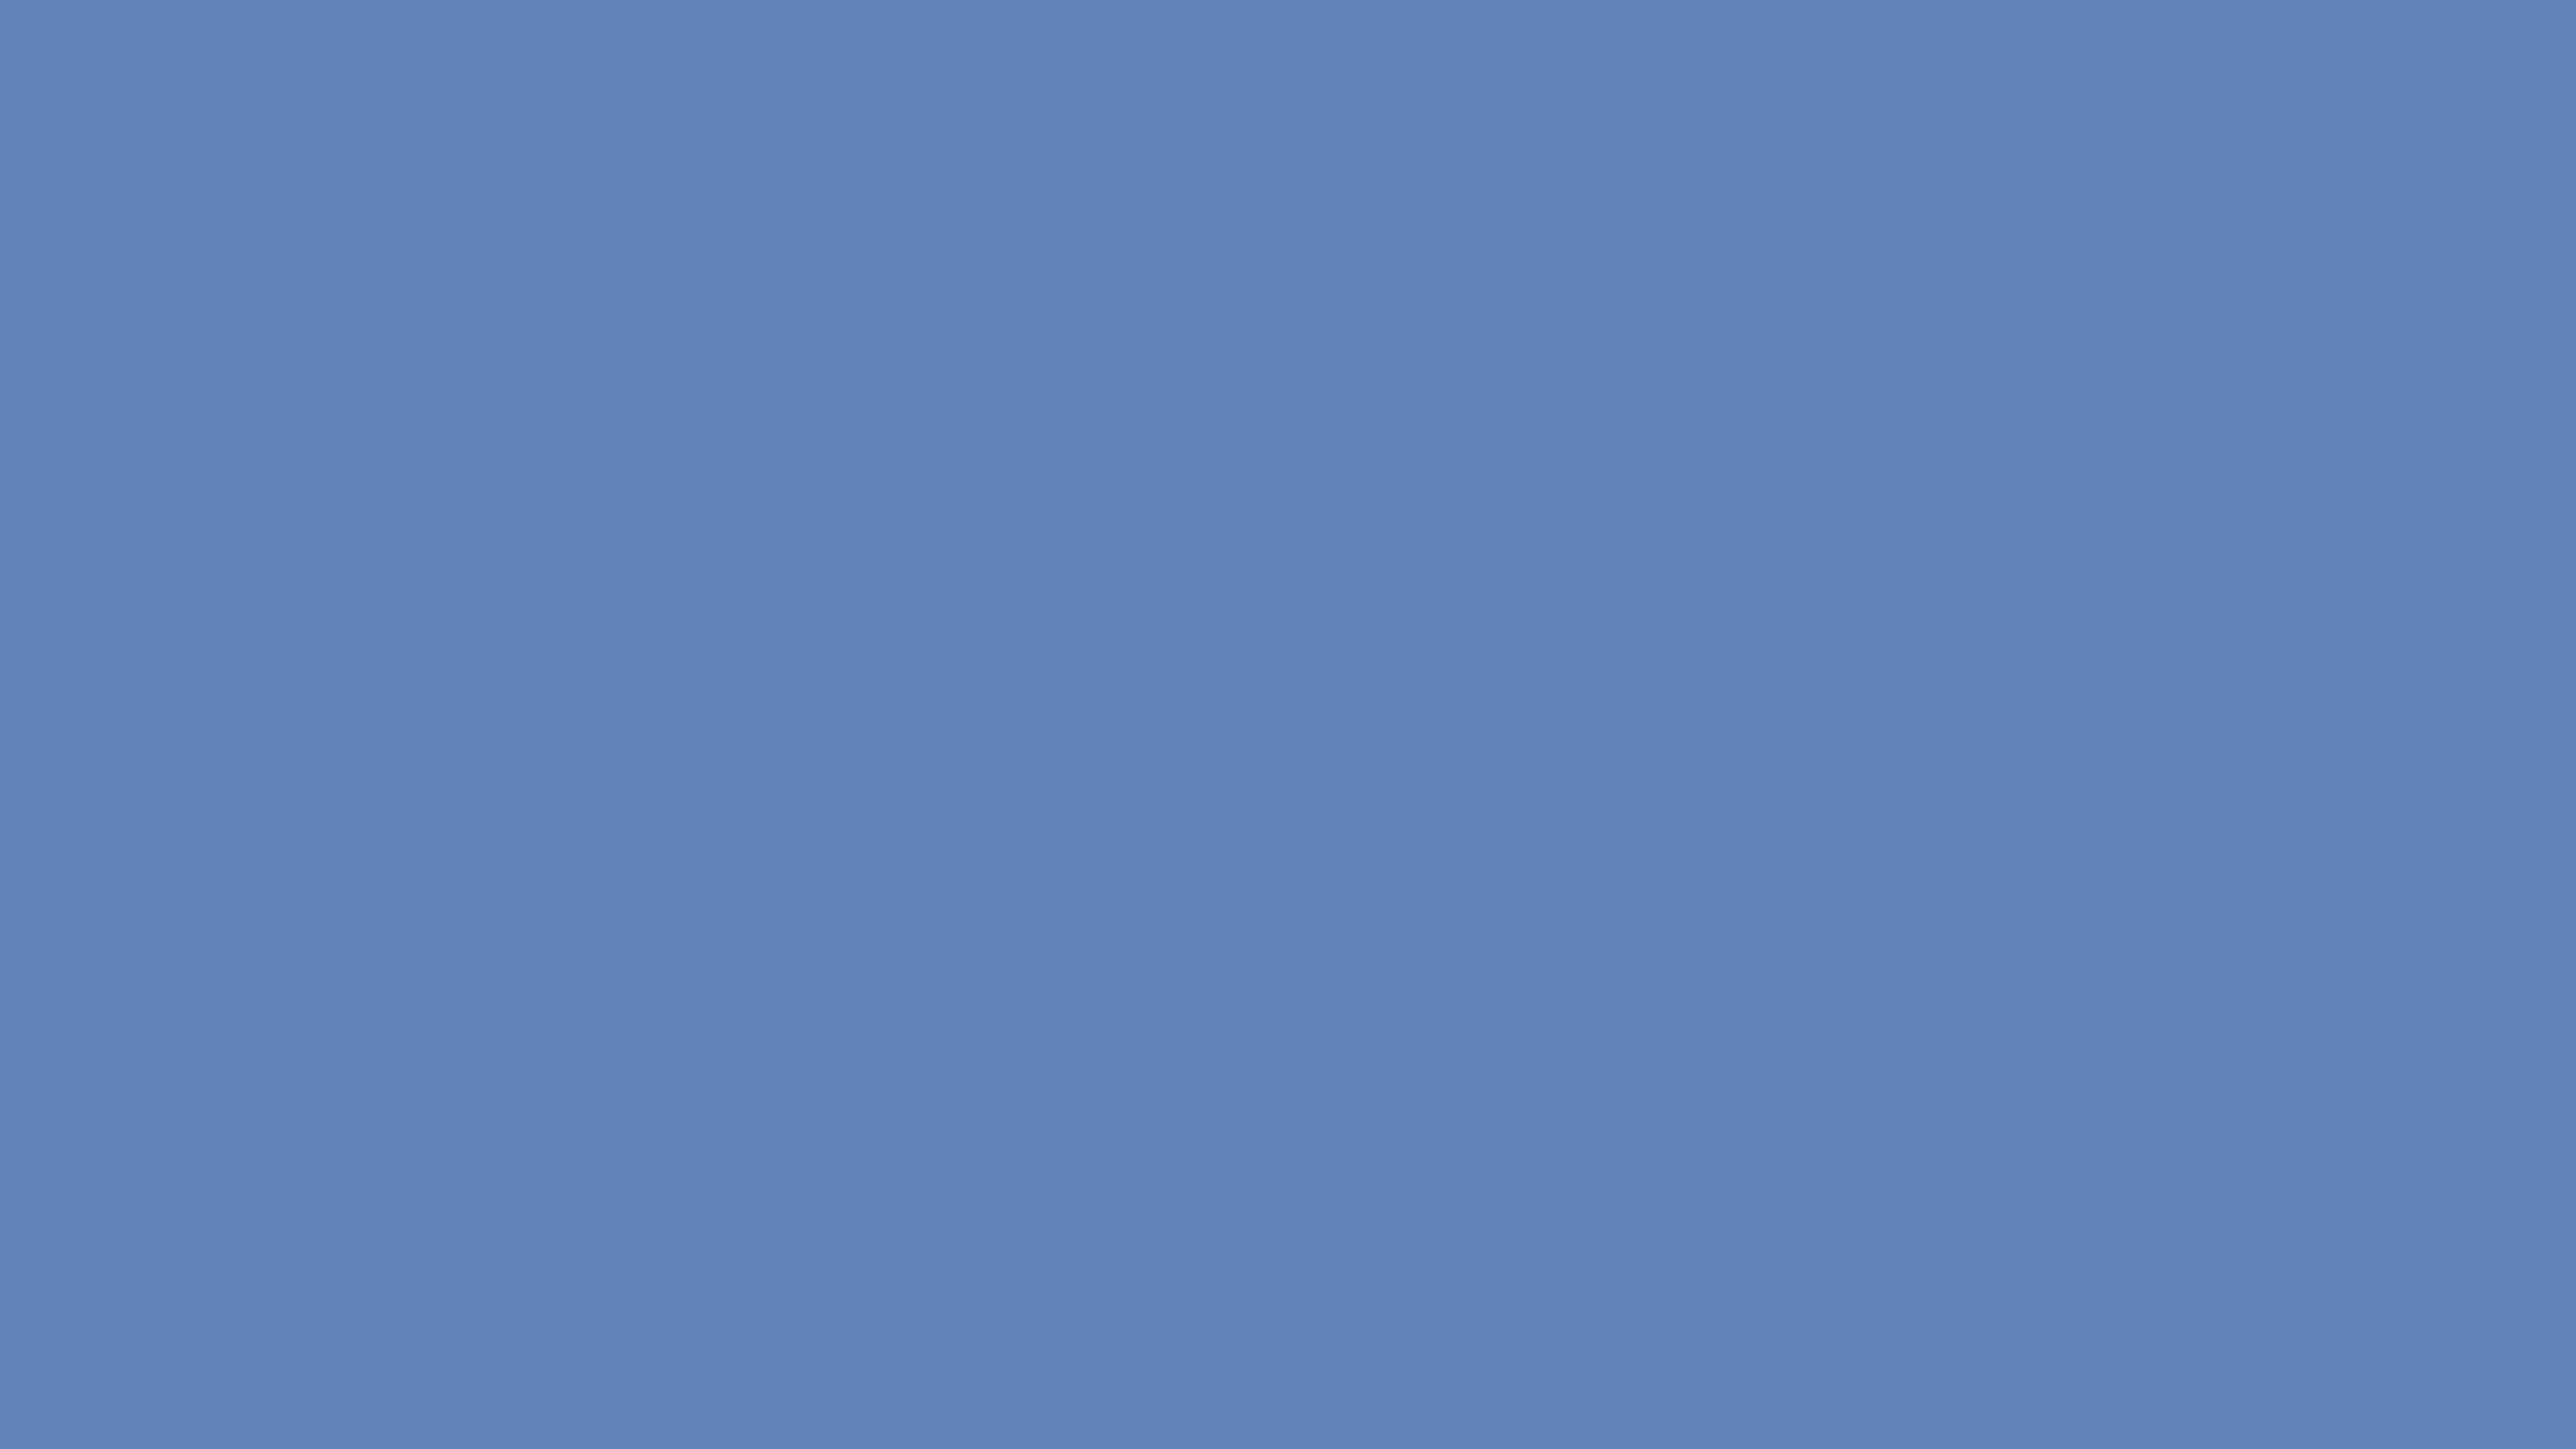 4096x2304 Glaucous Solid Color Background